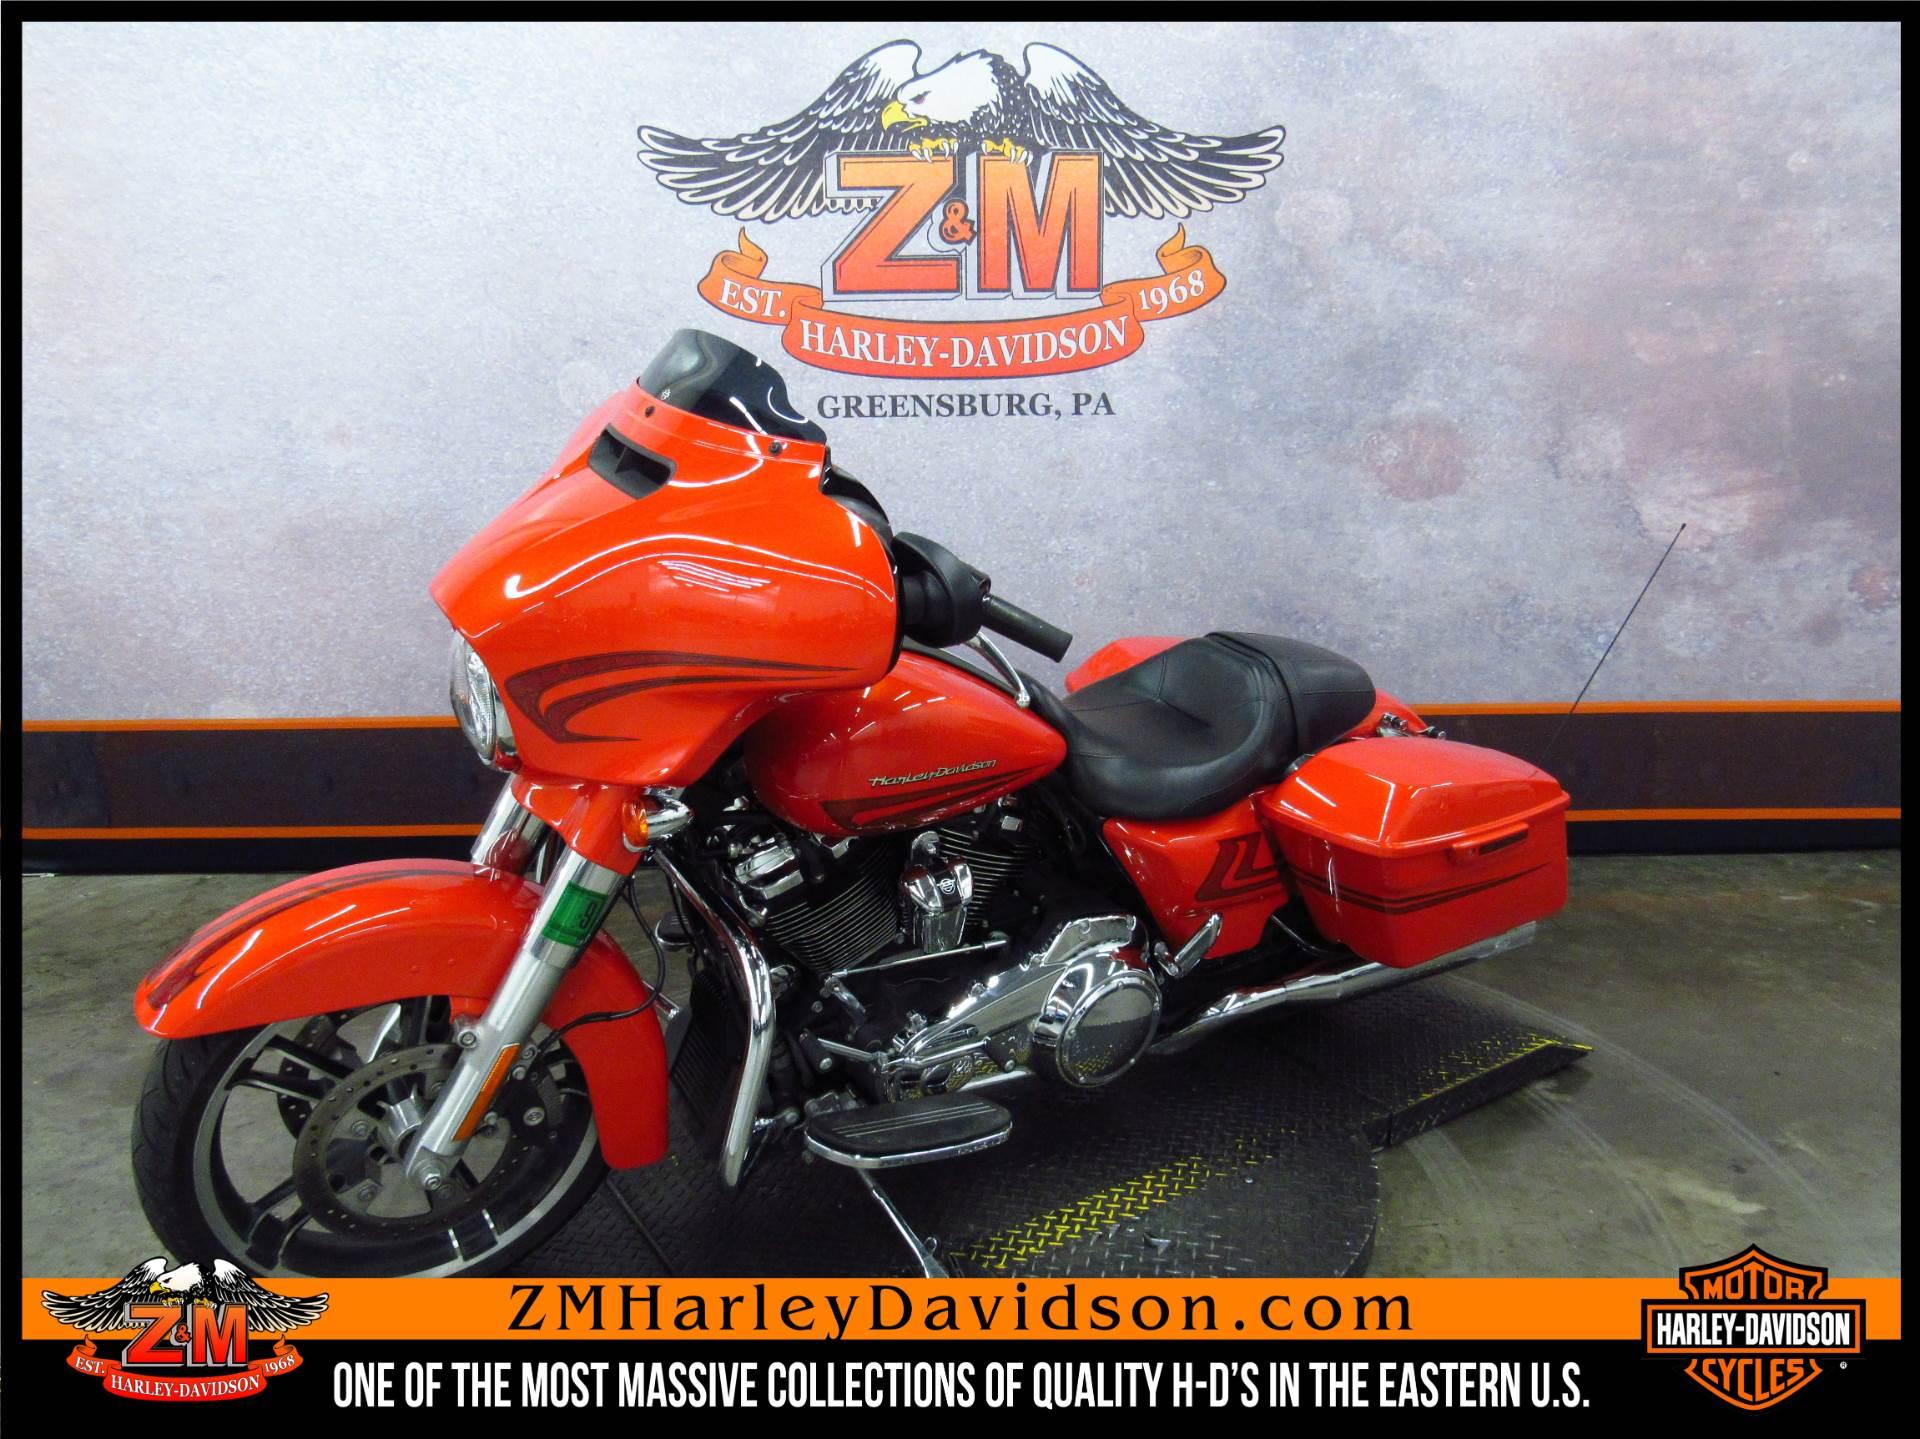 2017 Harley-Davidson Street Glide Special 5